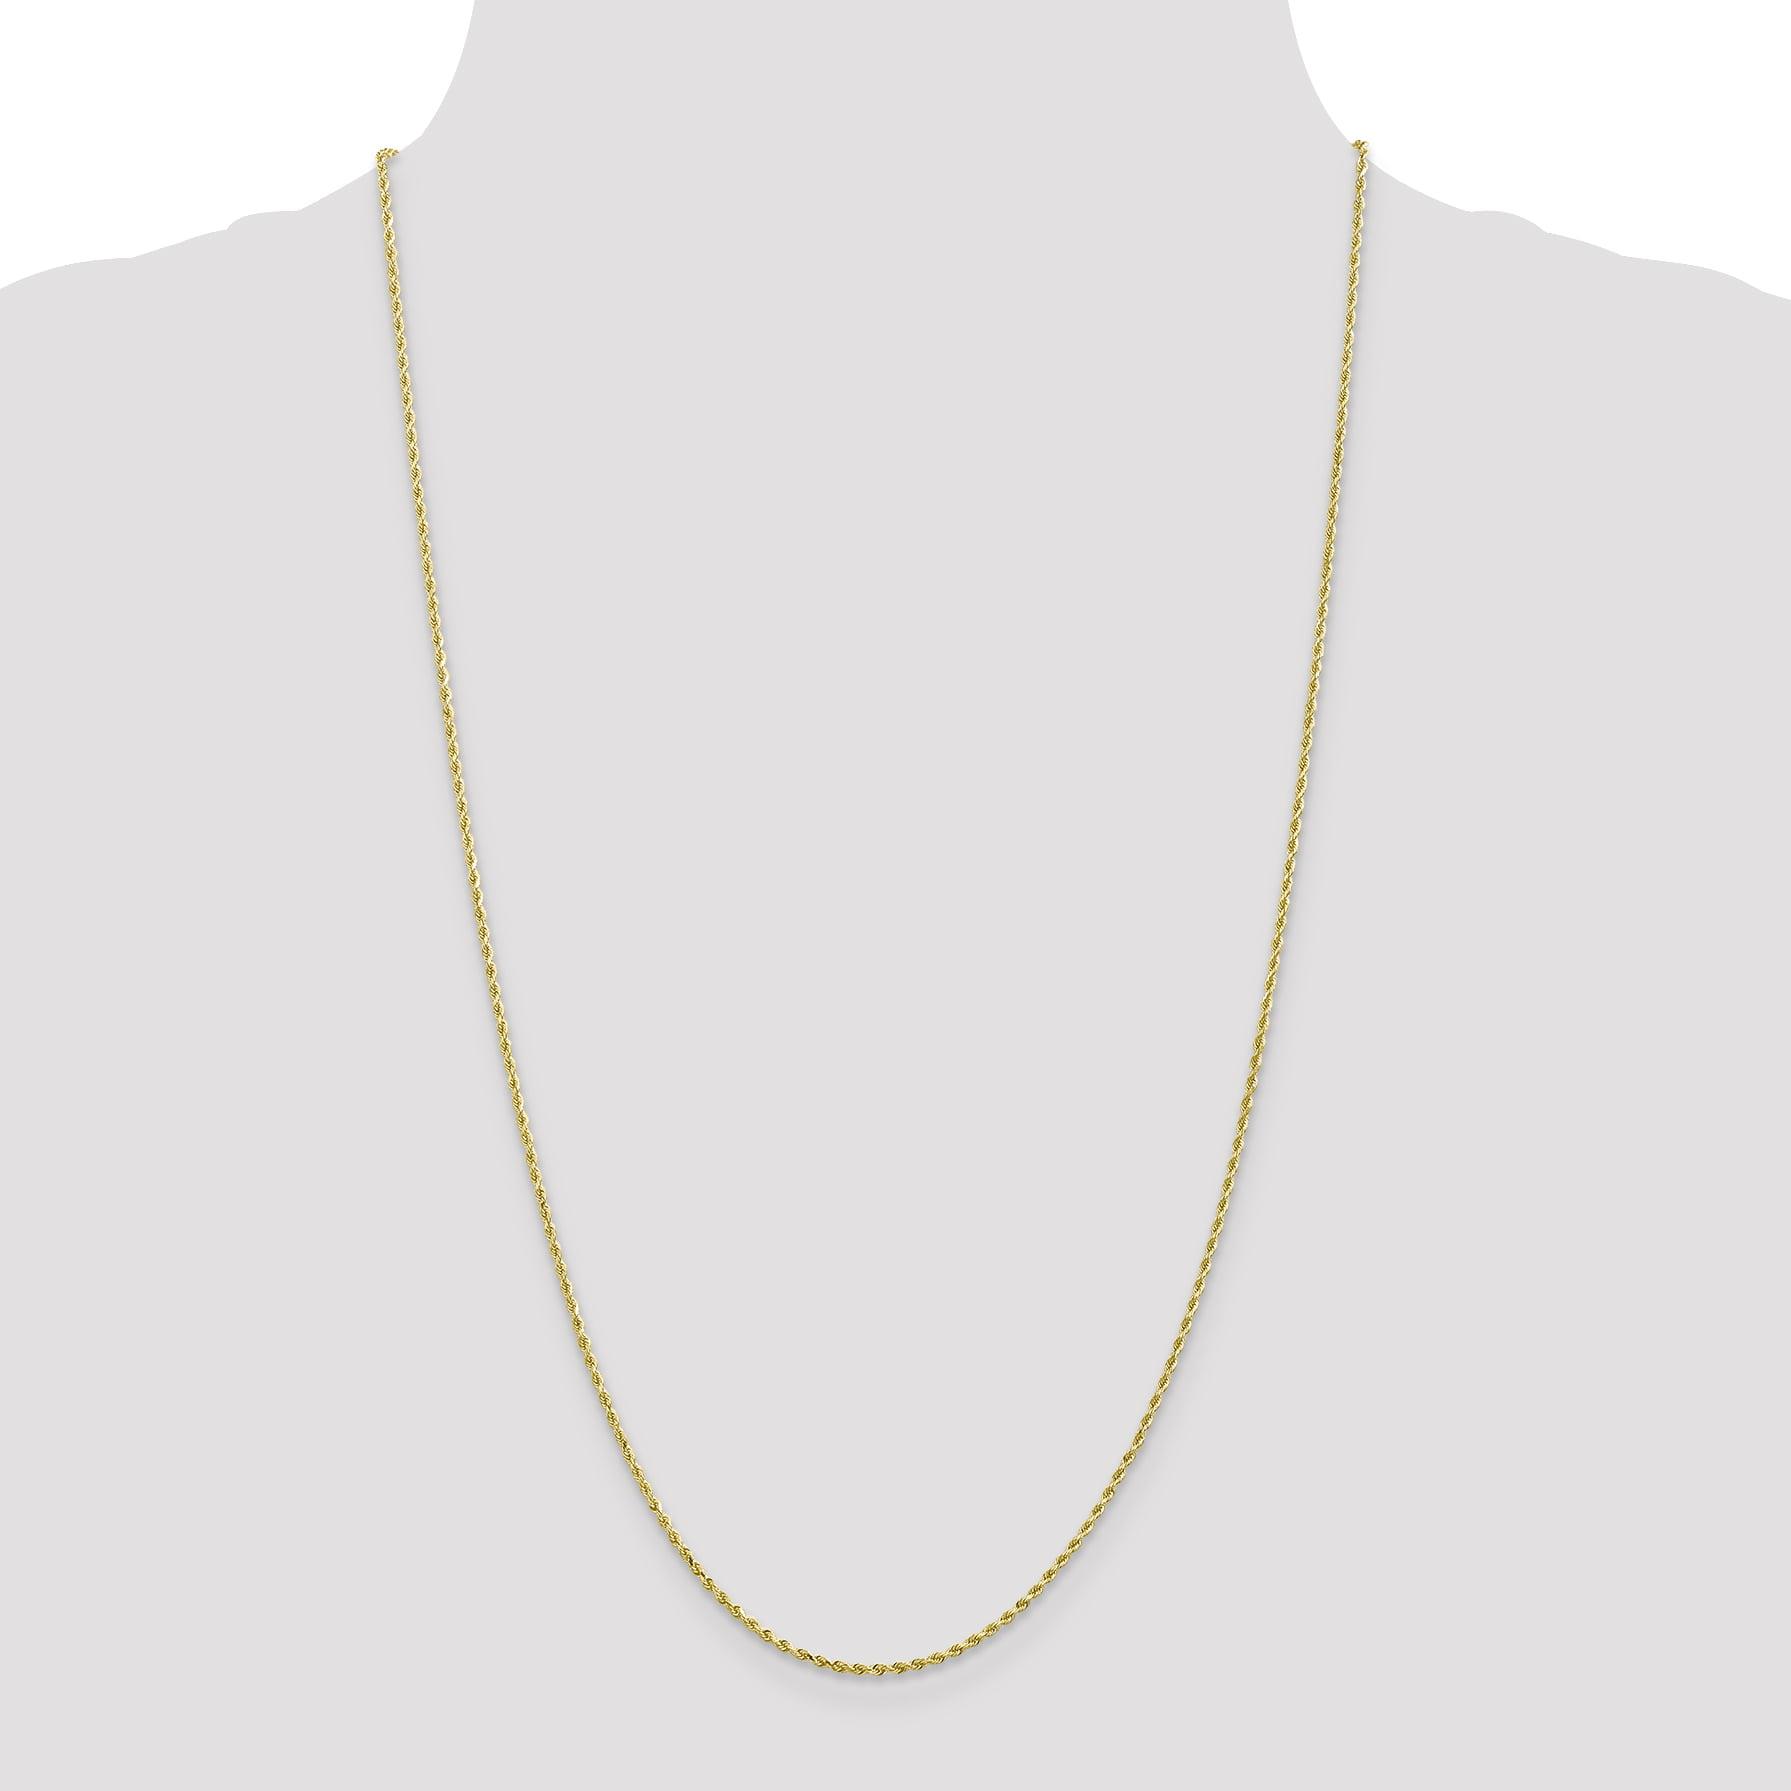 10K Yellow Gold 1.75mm Handmade Diamond Cut Rope Chain 30 Inch - image 3 de 5